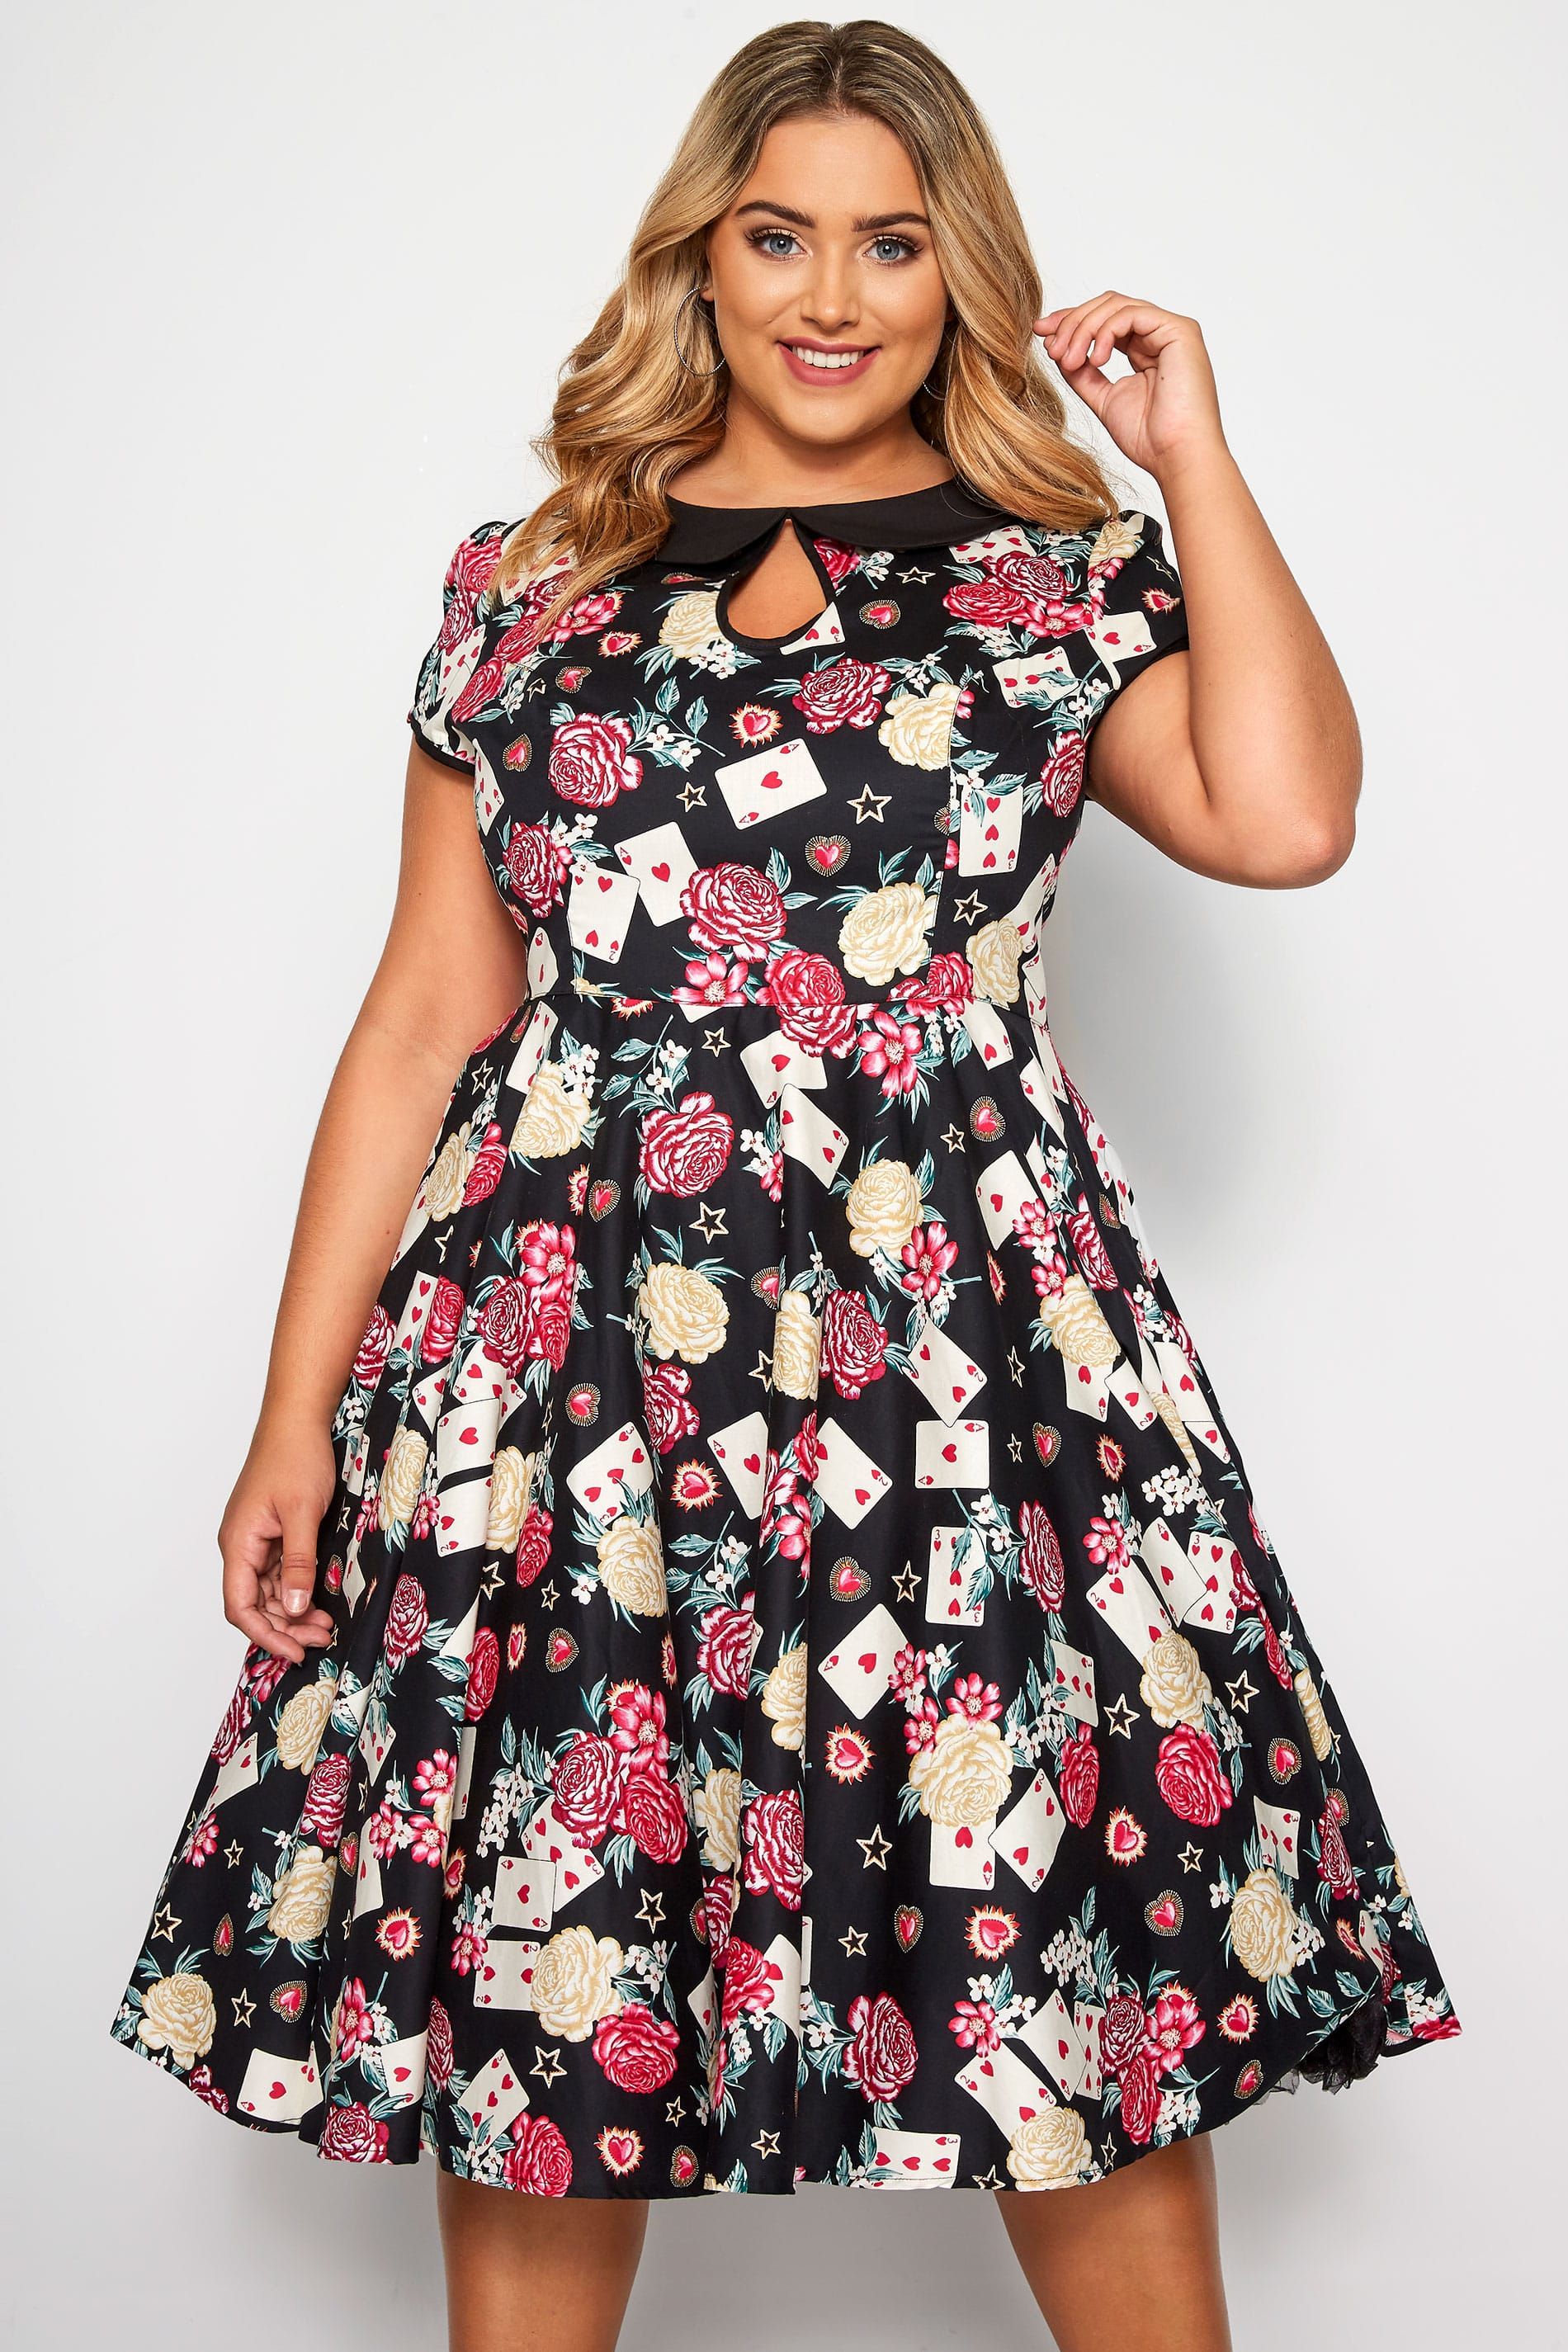 HELL BUNNY Black Queen Of Hearts Dress